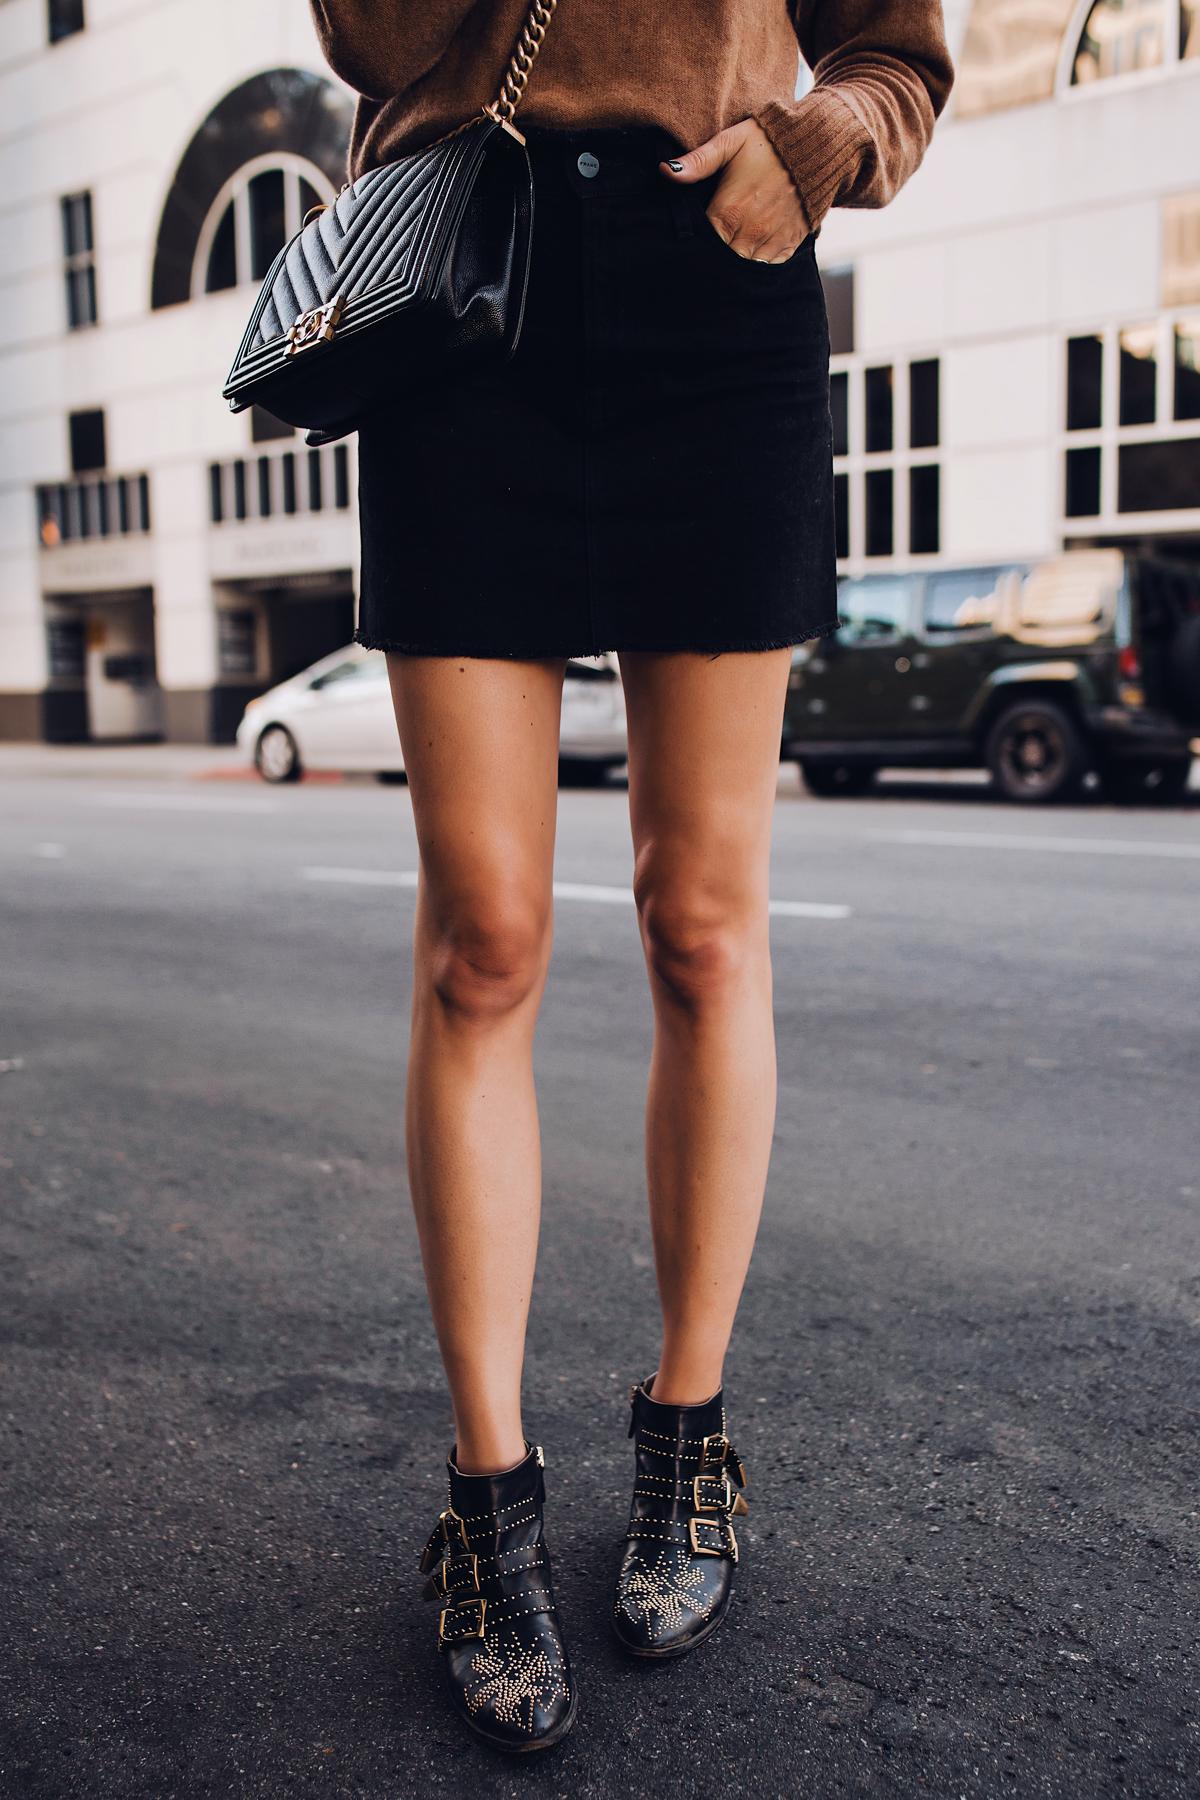 Woman Wearing Black Skirt Chloe Susanna Black Booties Chanel Black Boy Bag Fashion Jackson San Diego Fashion Blogger Street Style